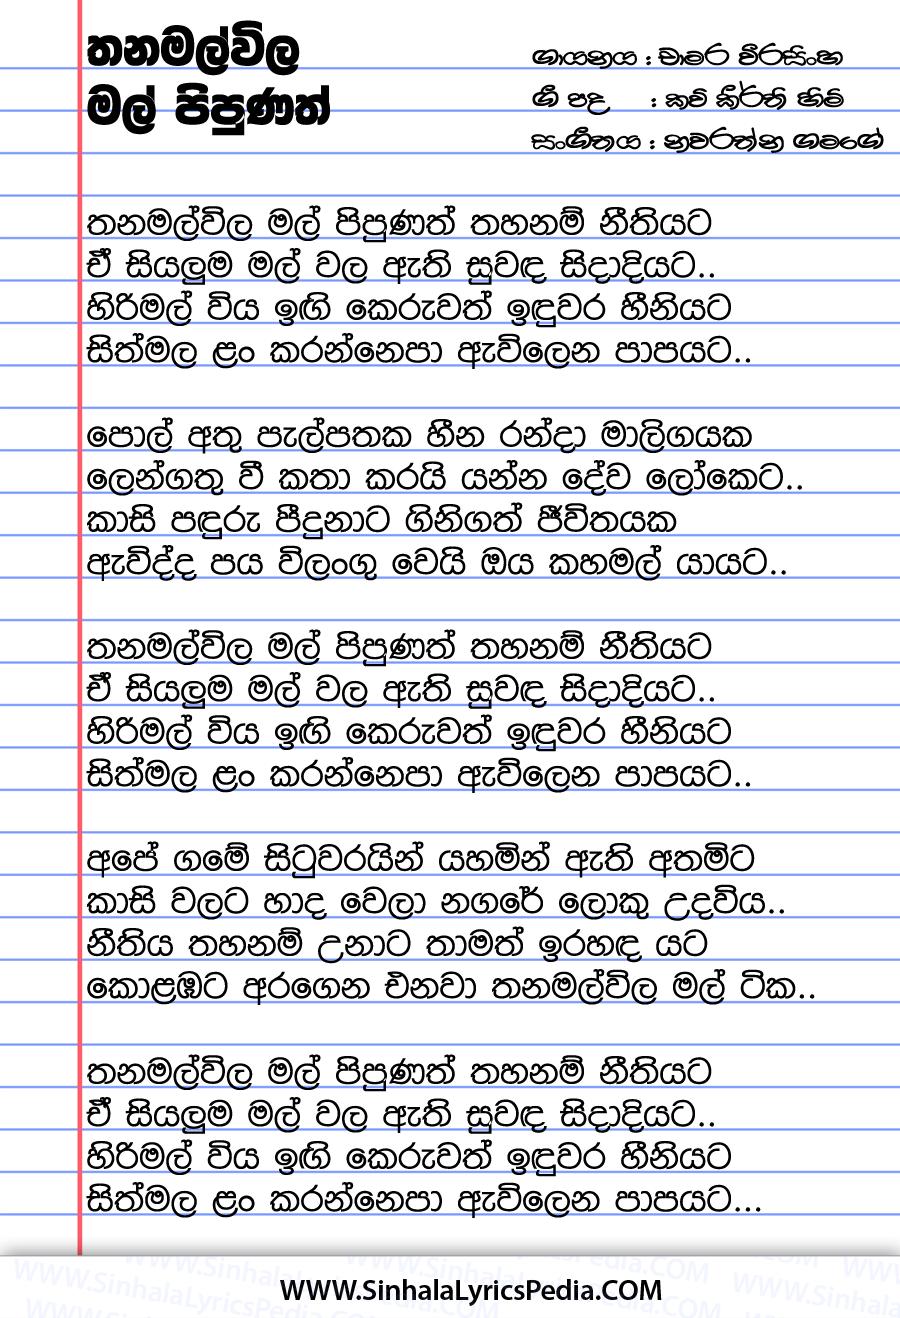 Thanamalwila Mal Pipunata Thahanam Neethiyata Song Lyrics